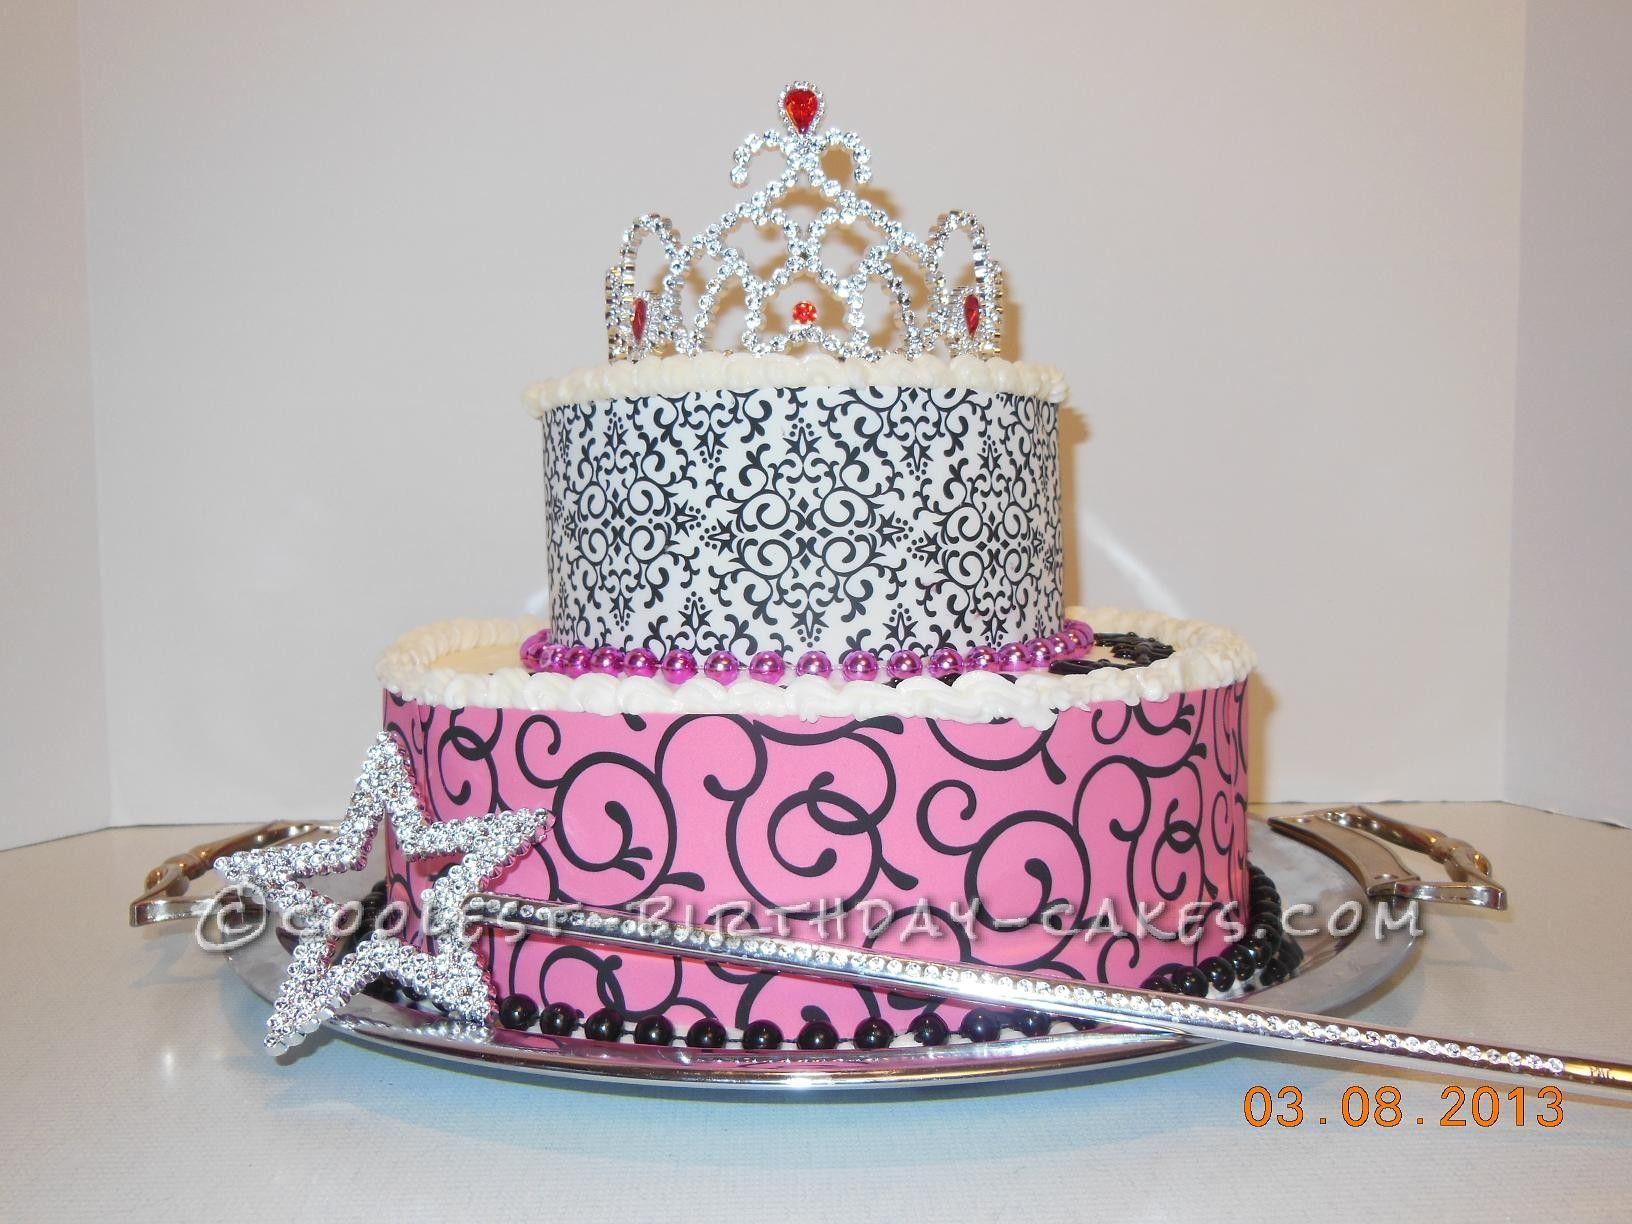 40 Year Old Diva Birthday Cake Diva birthday cakes Birthday cakes